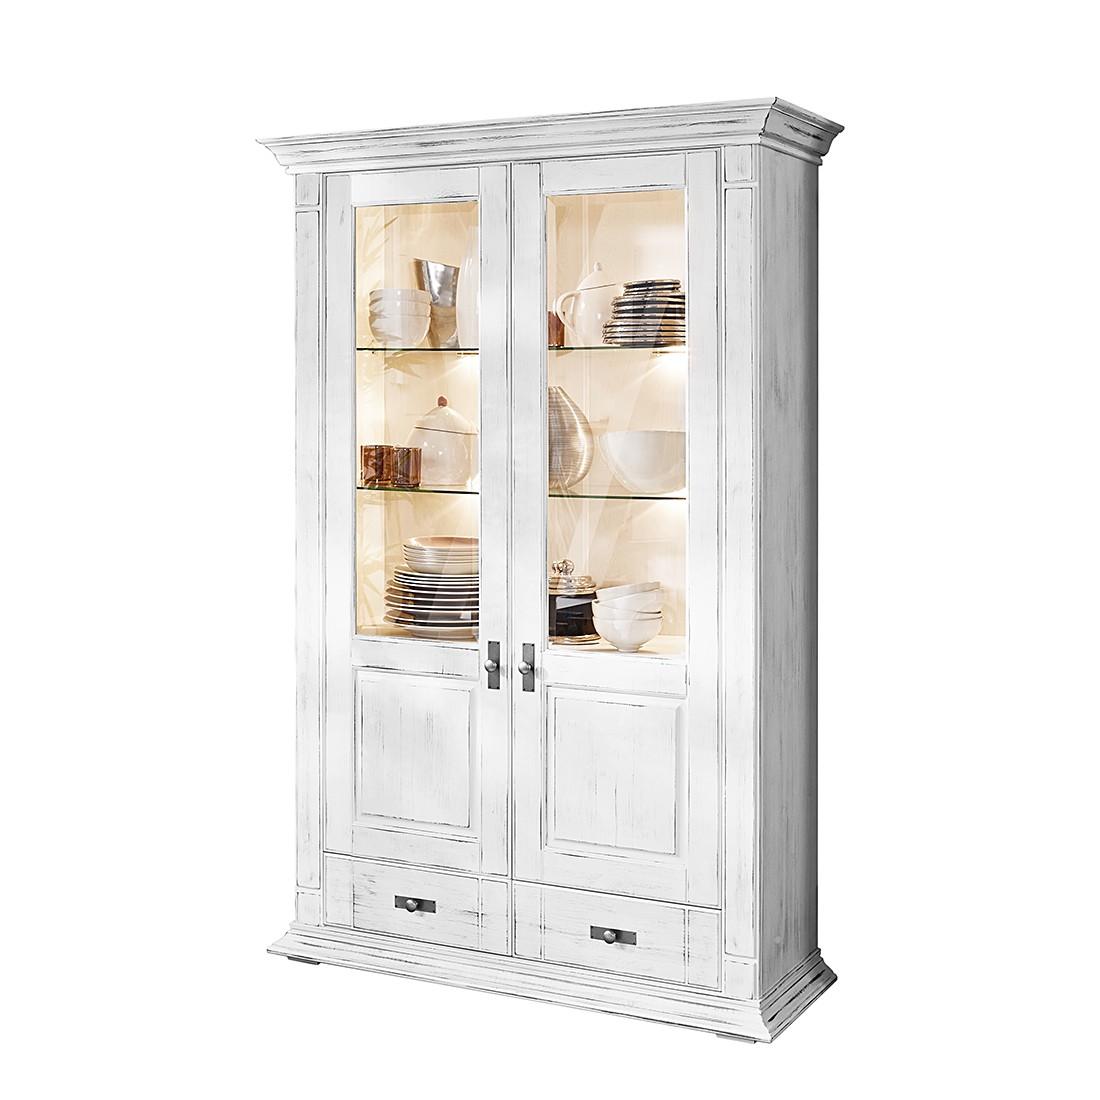 schuhschrank cabinet metall schwarz h he 103 cm 3. Black Bedroom Furniture Sets. Home Design Ideas